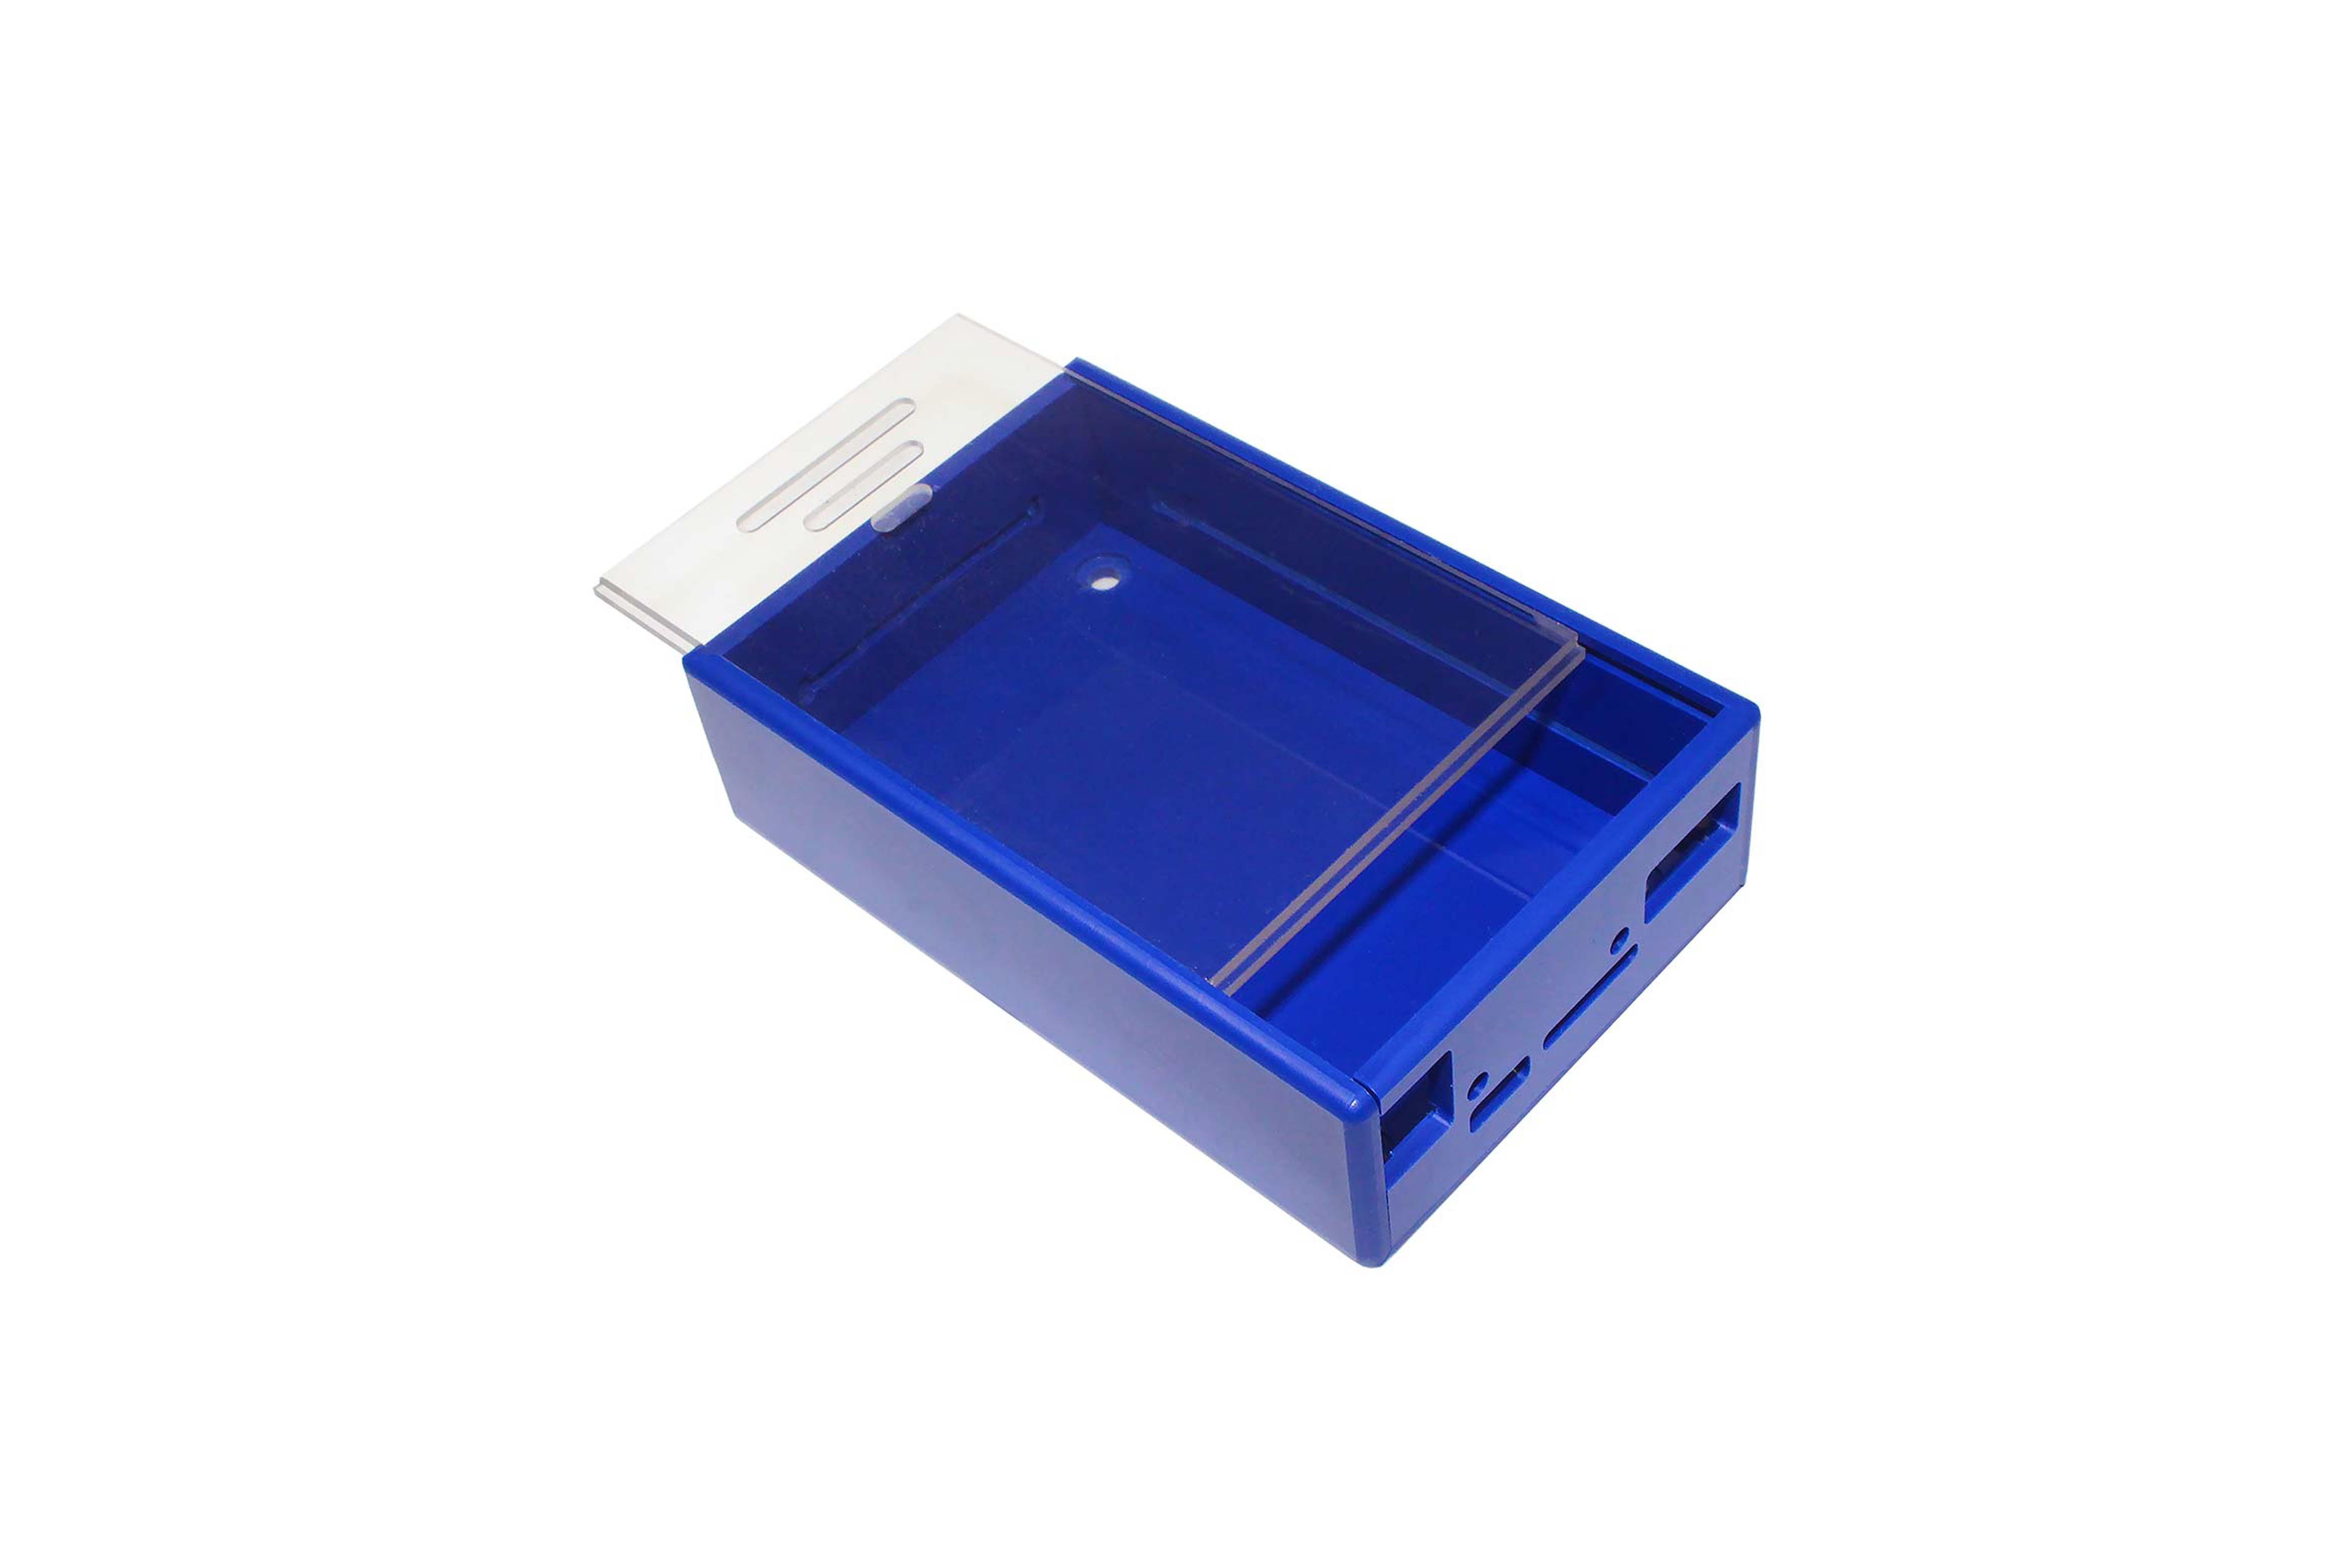 DesignSpark Beaglebone Blue-behuizing, blauw/transparant